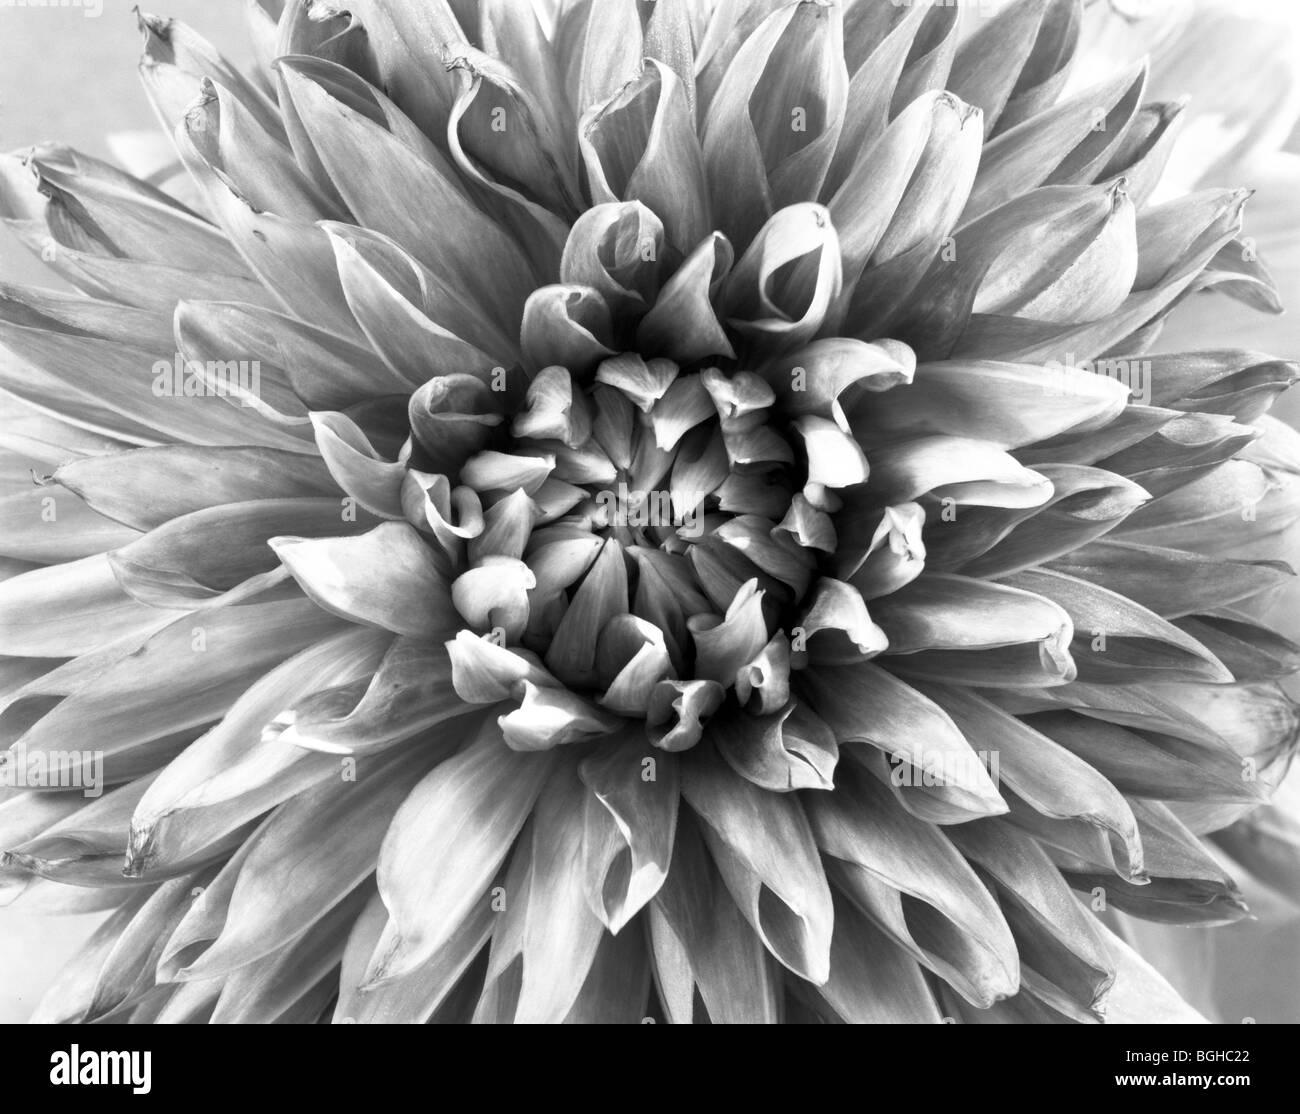 Dahlia flower black and white stock photos images alamy washington dahlia flower in full bloom stock image izmirmasajfo